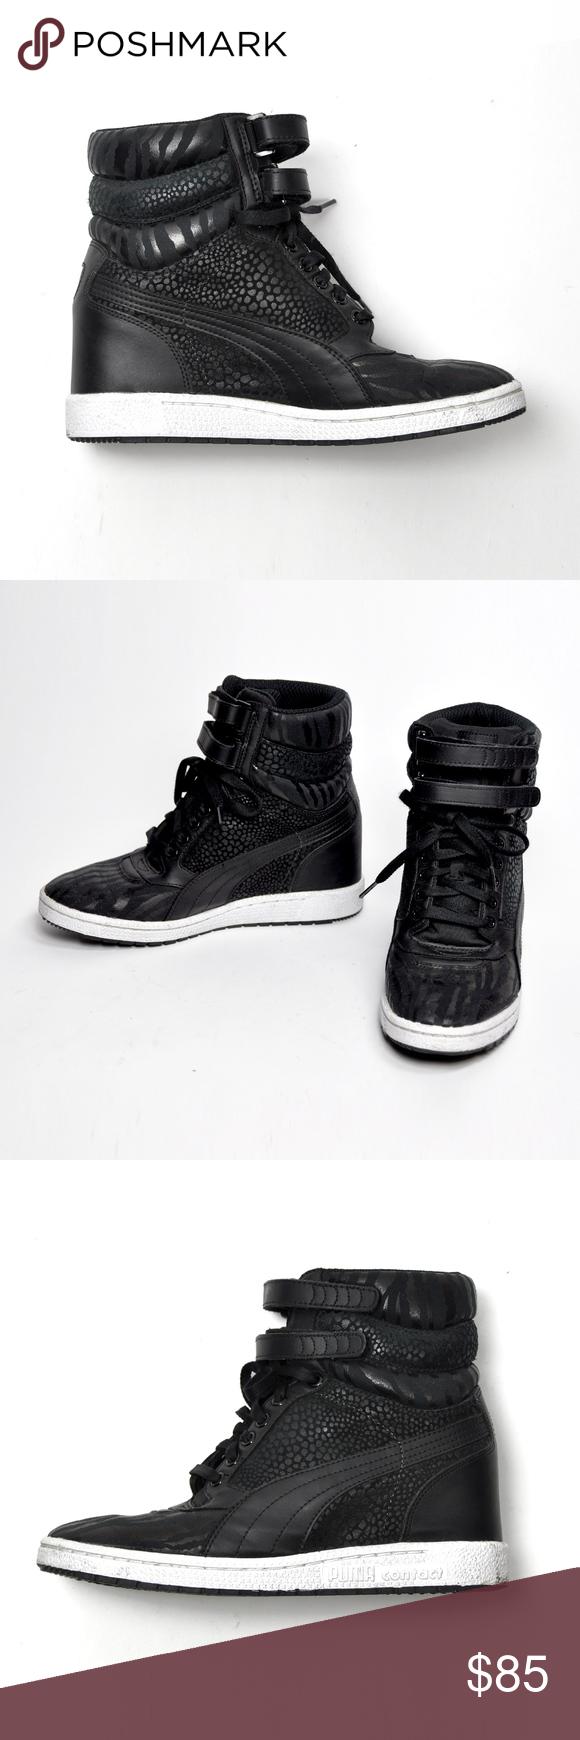 94aa9f5397 Puma Sky Reptile Wedge Sneakers Women's Size 9.5 Puma Sky Reptile Wedge  Lace & Velcro